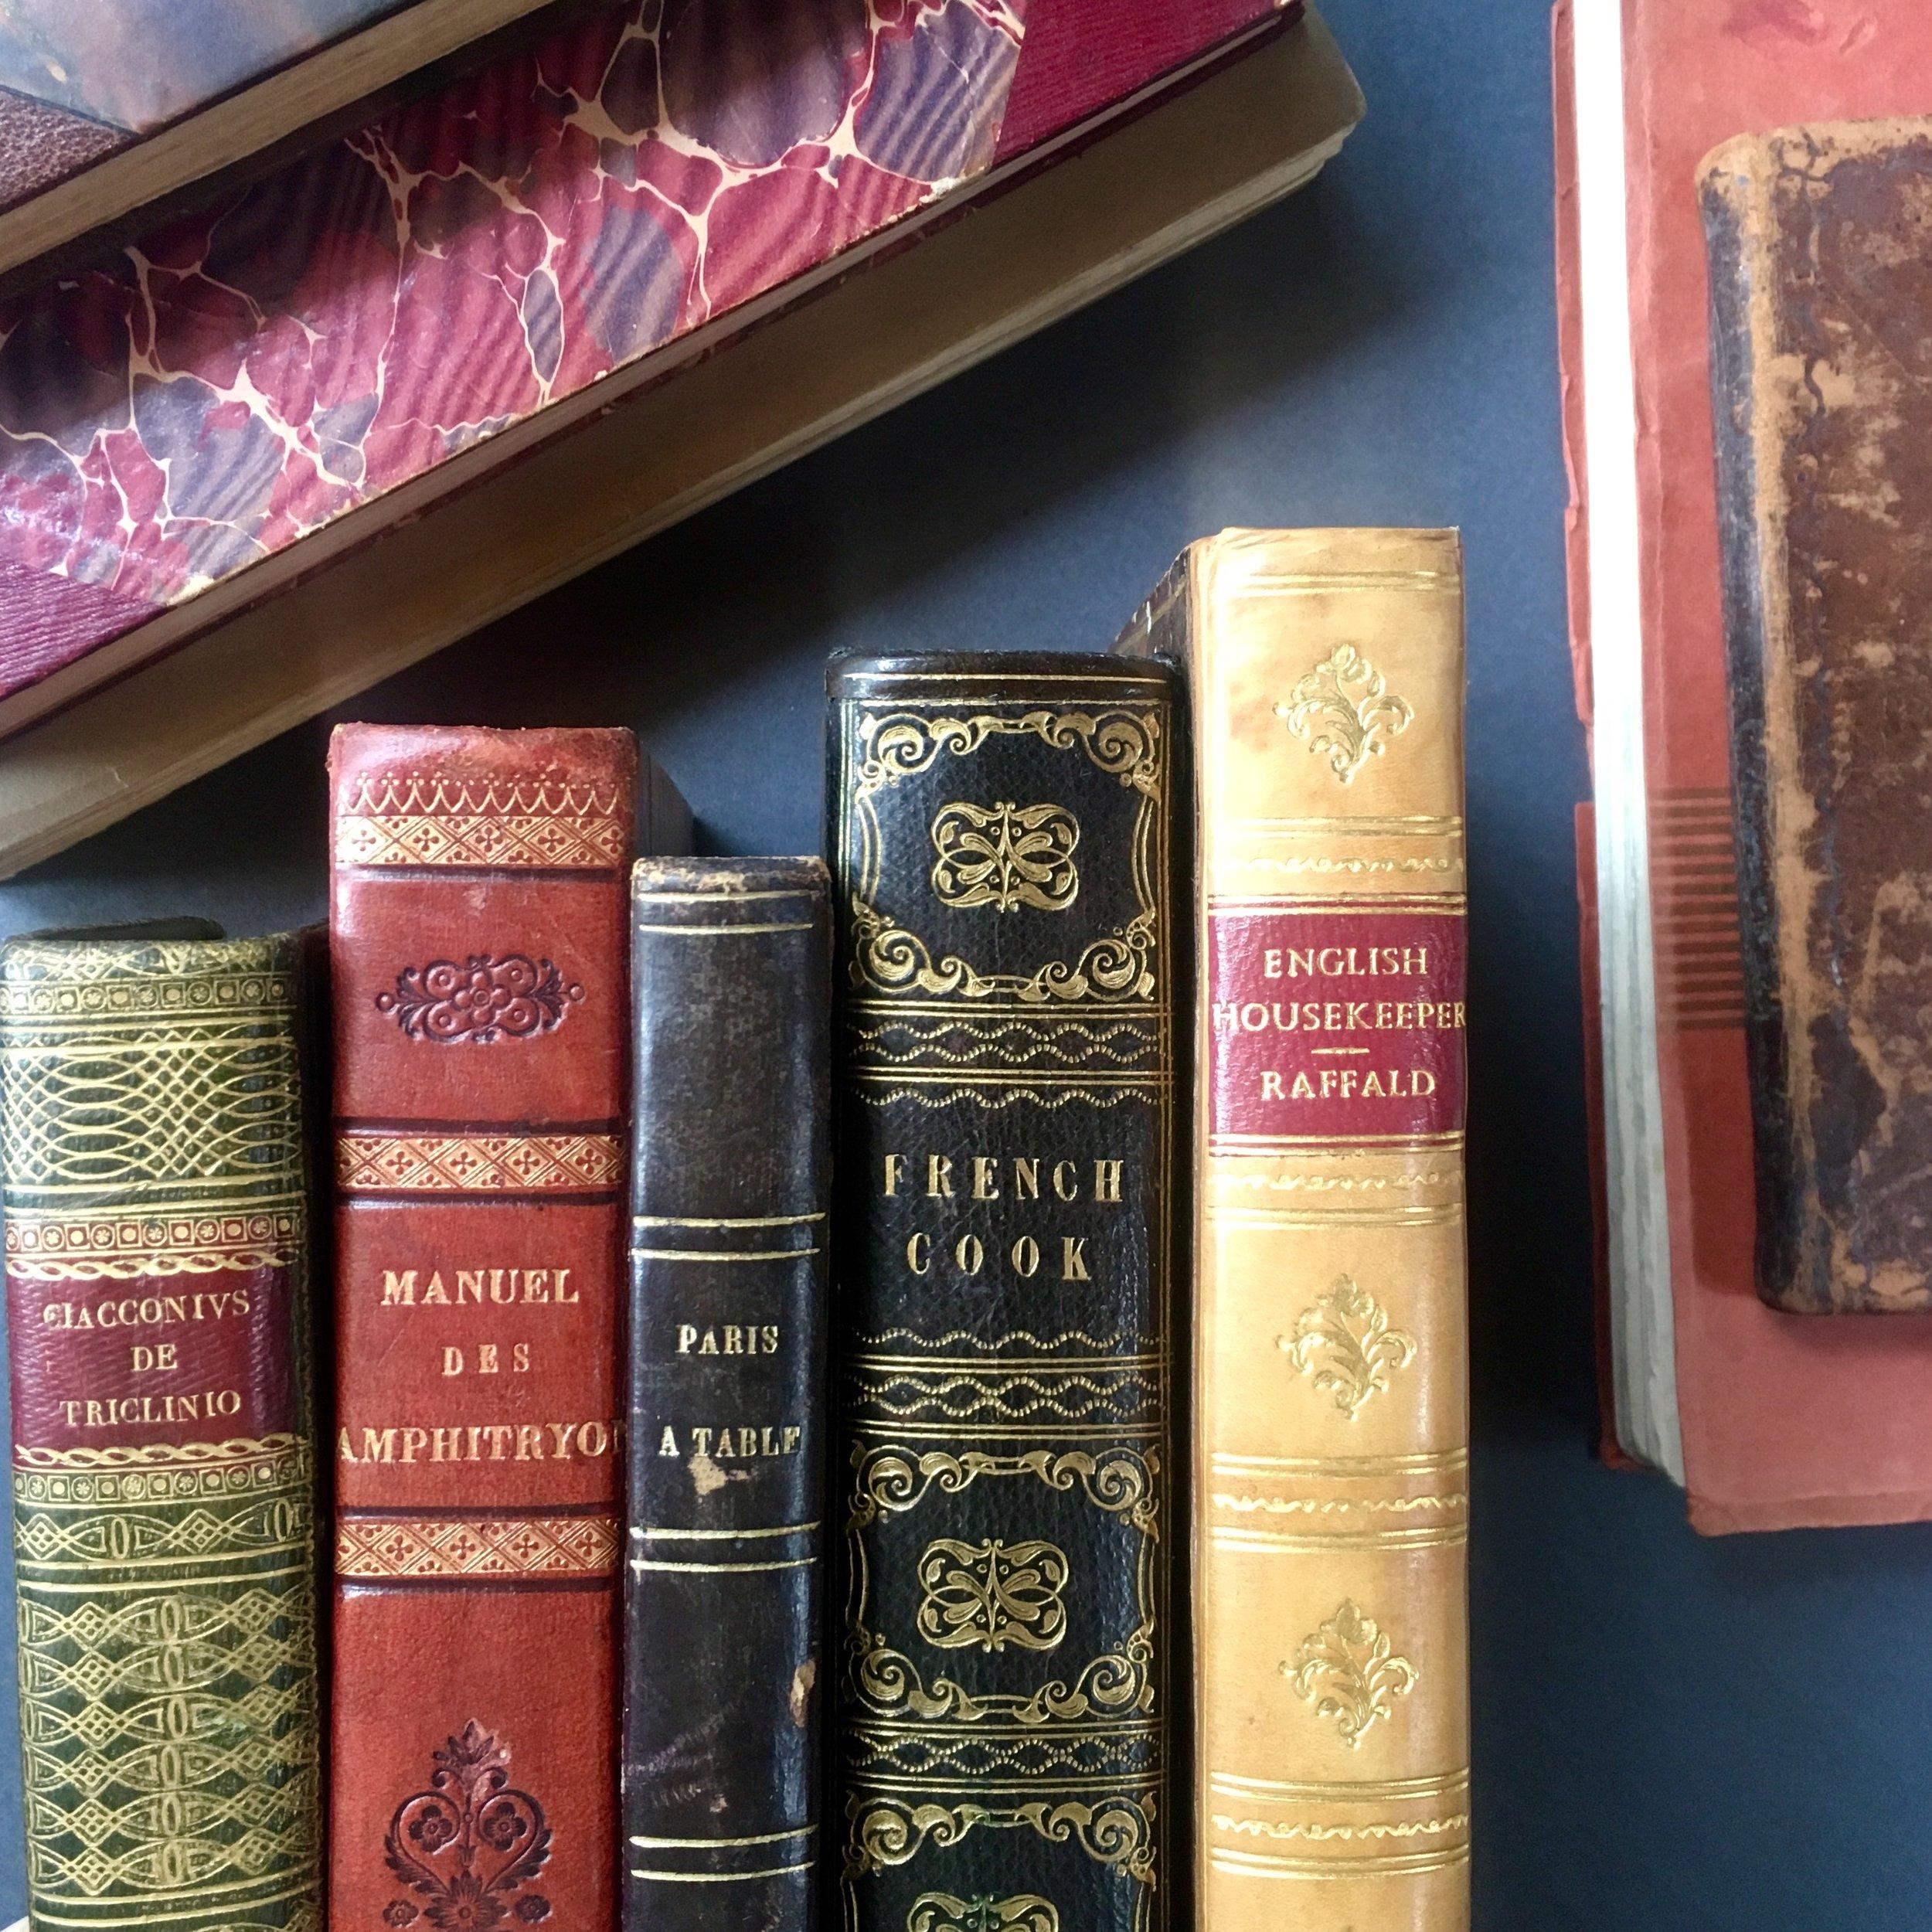 culinary rare books